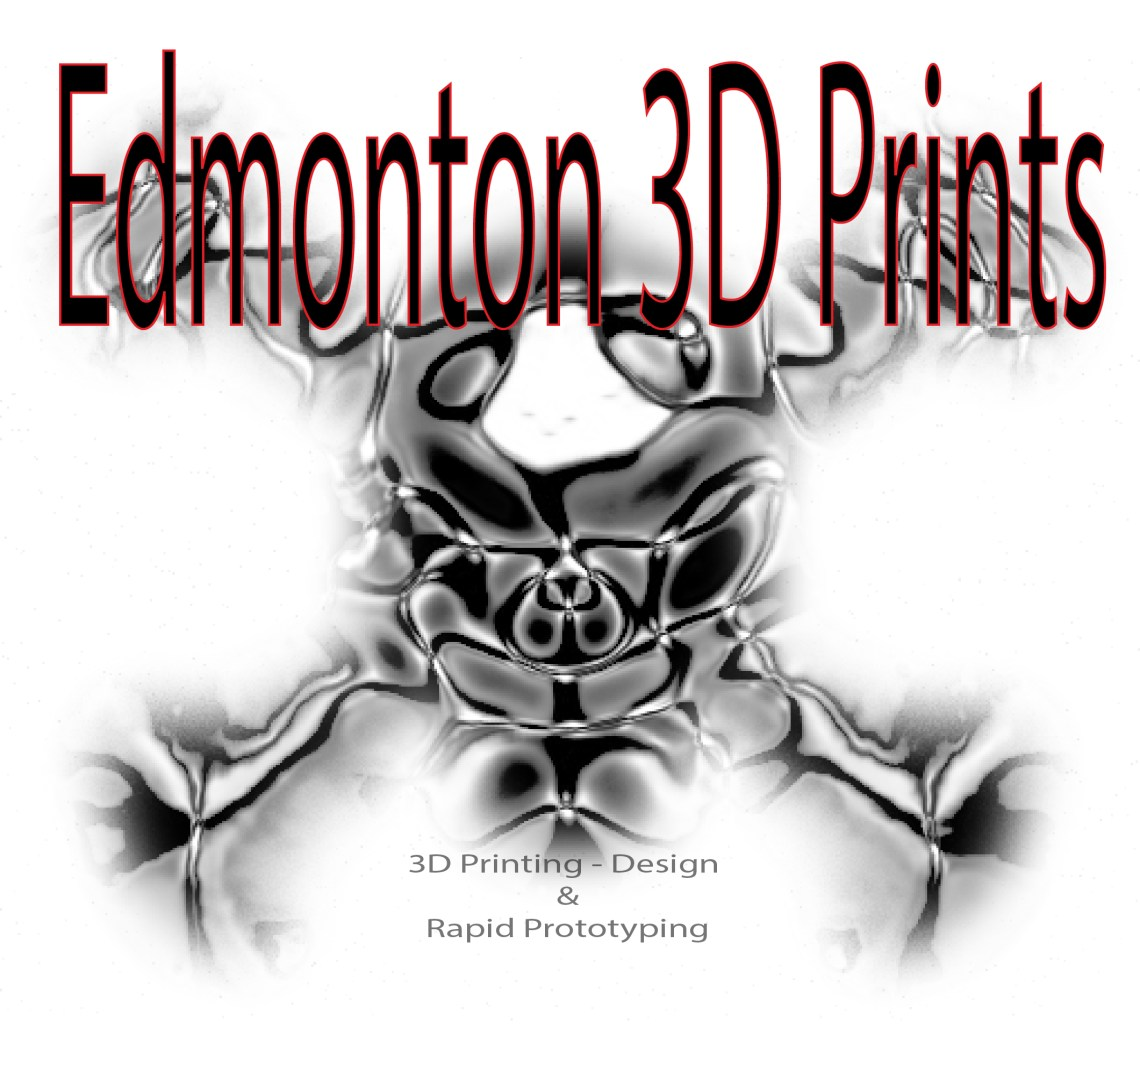 edmonton 3d prints stl